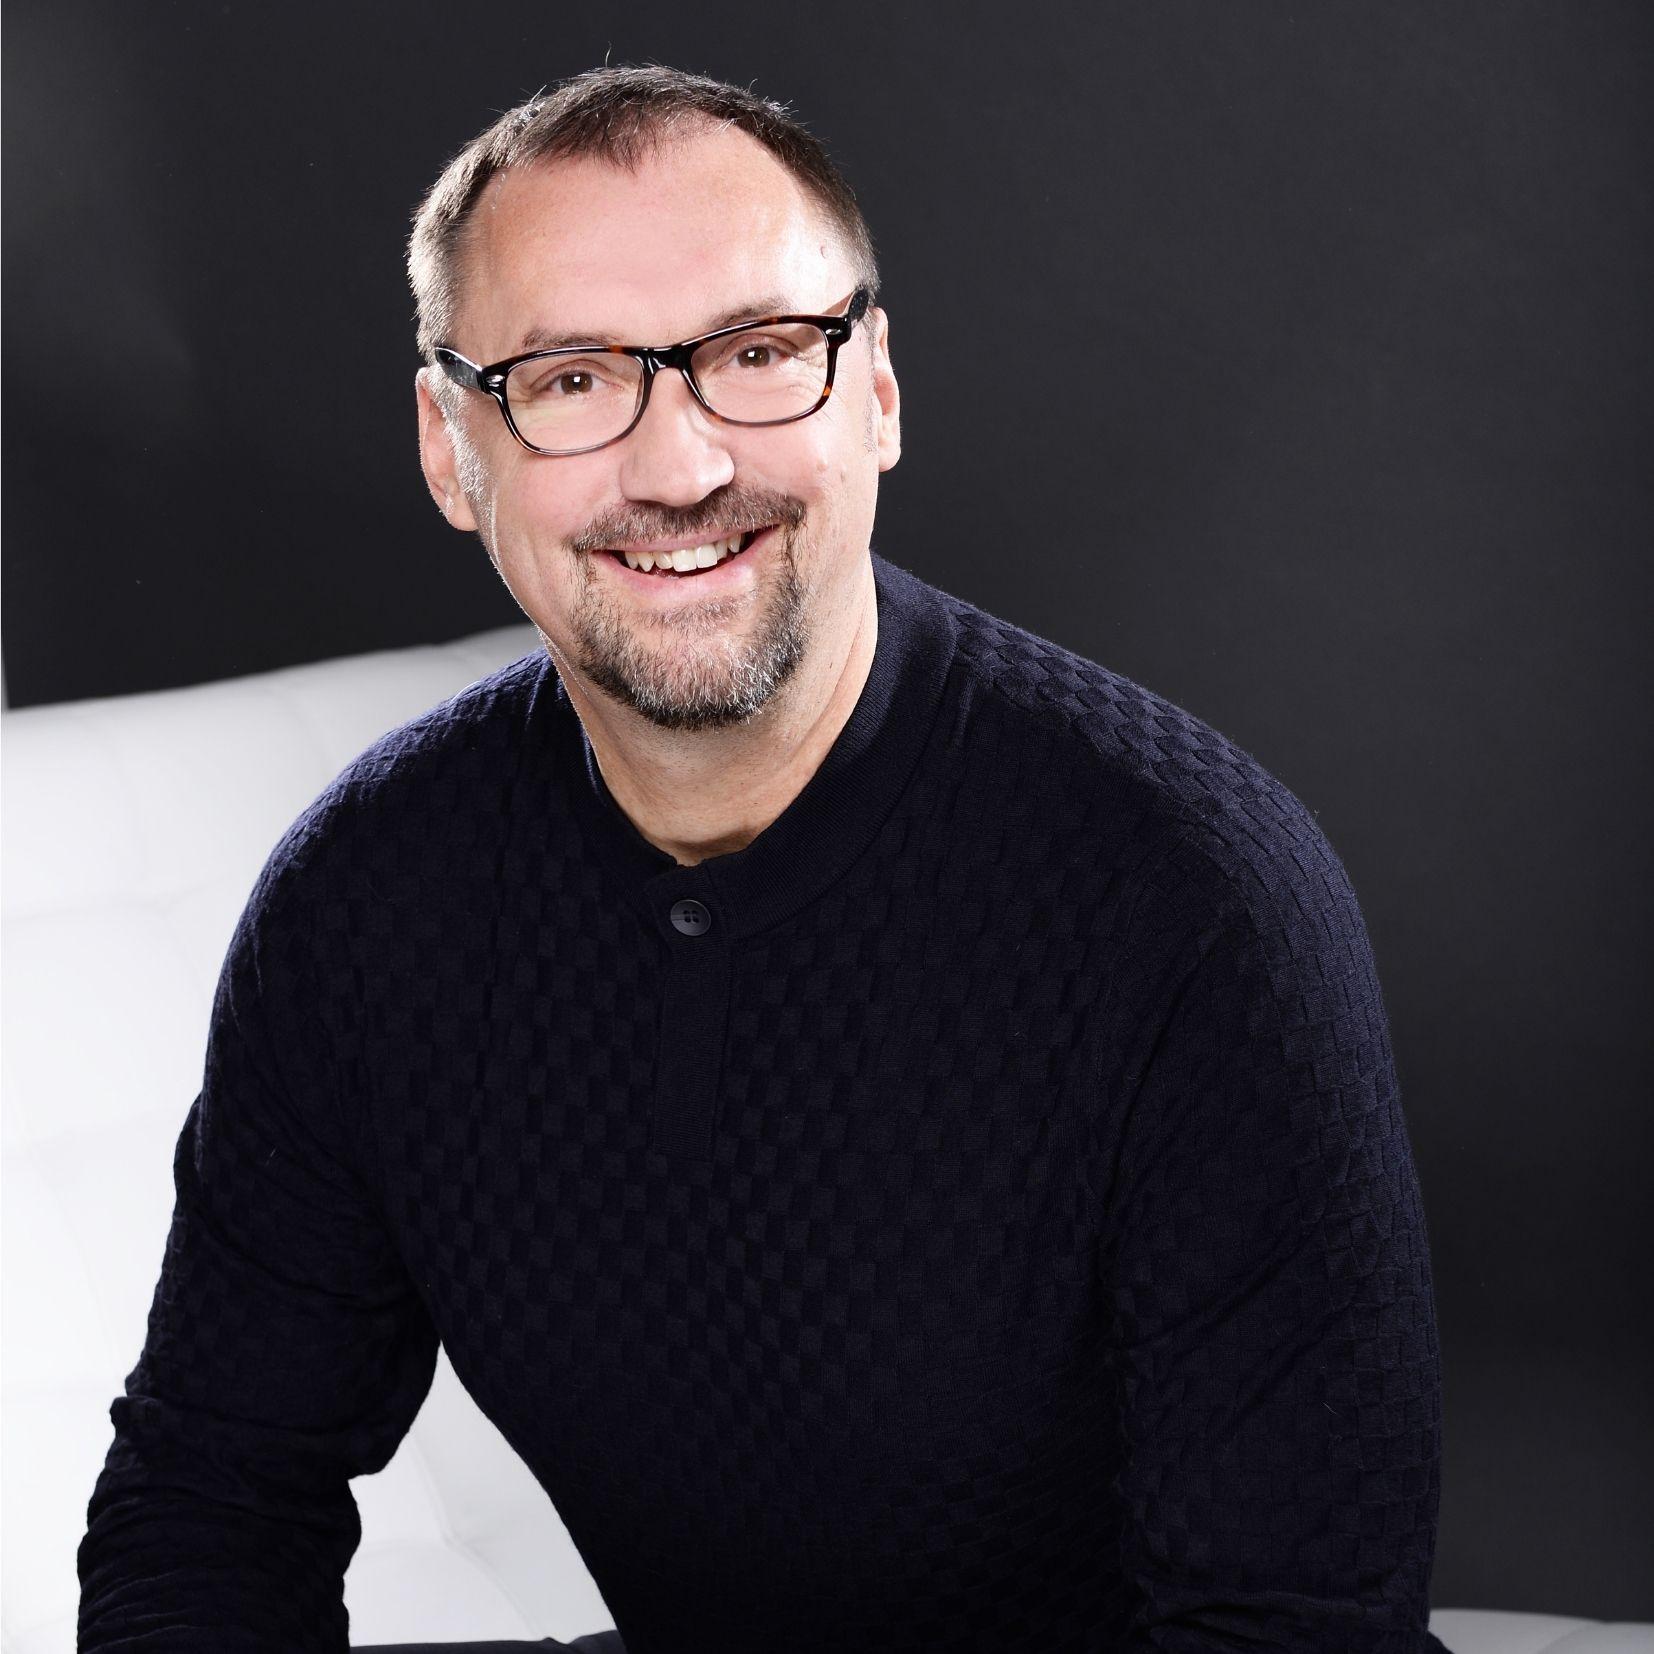 Thorsten Dargatz